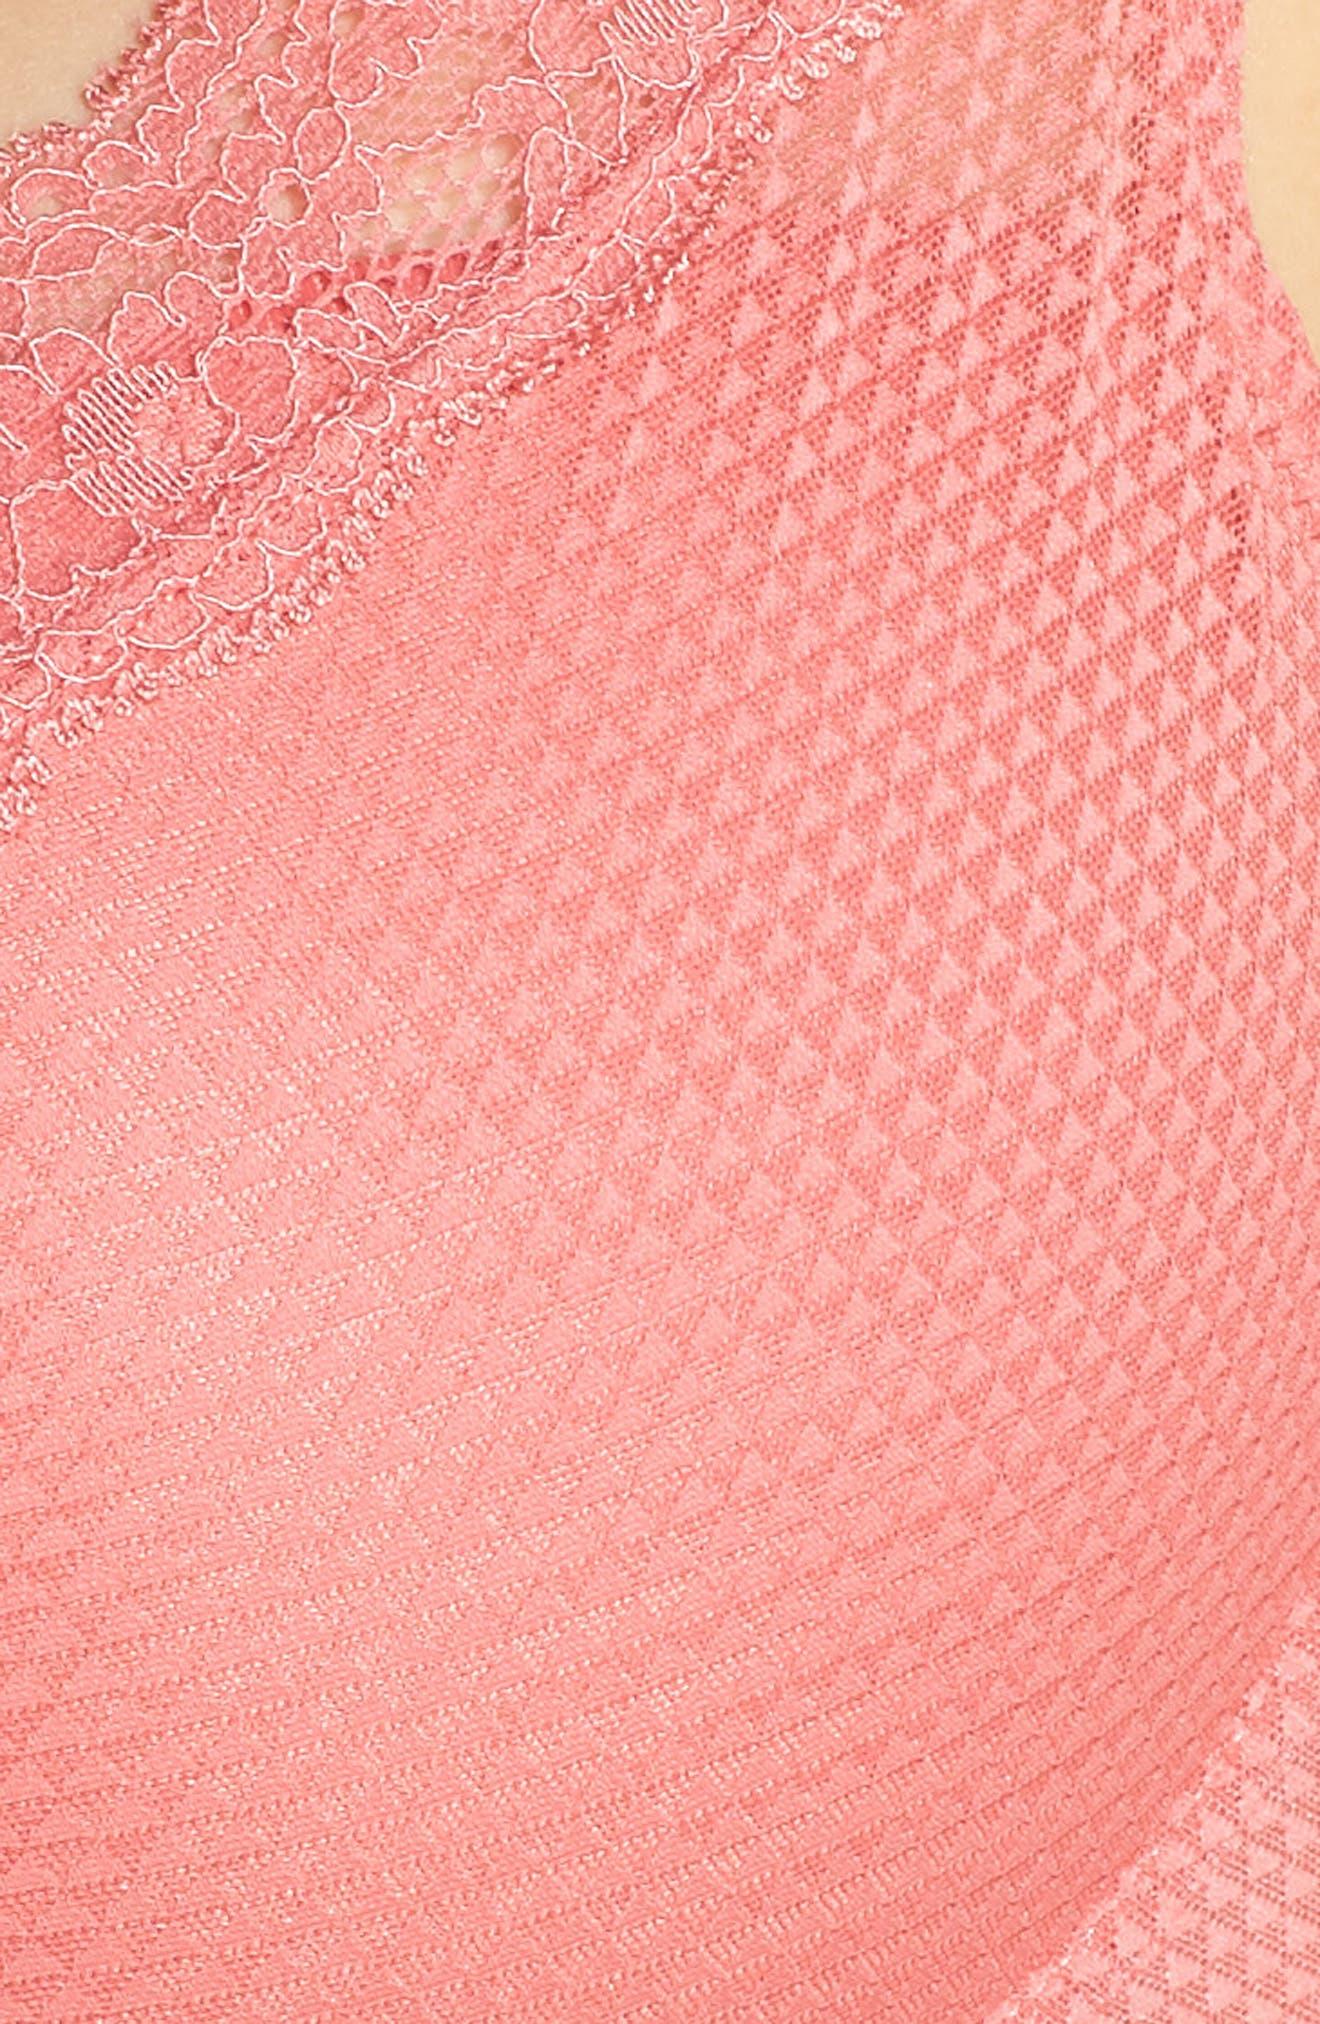 'Brooklyn' Underwire T-Shirt Bra,                             Alternate thumbnail 6, color,                             SUNSET